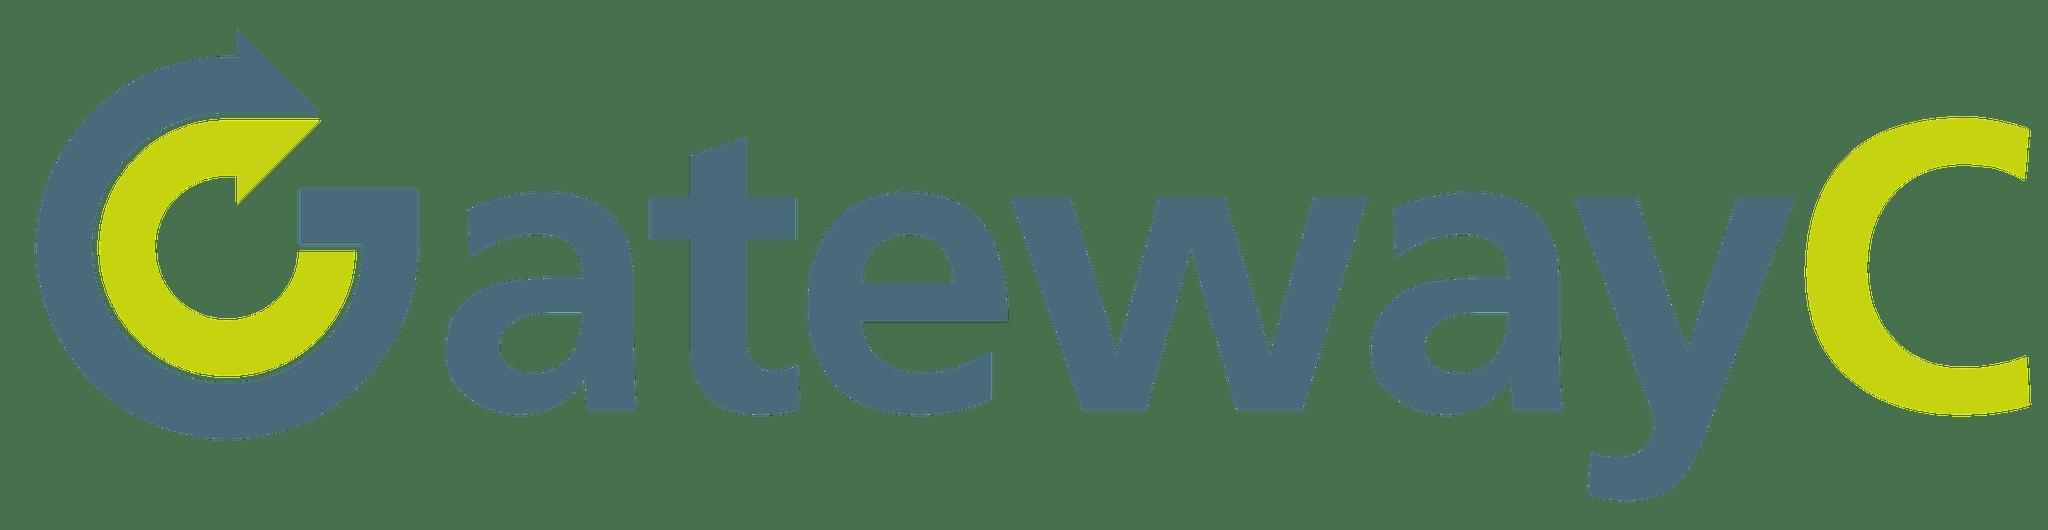 GatewayC